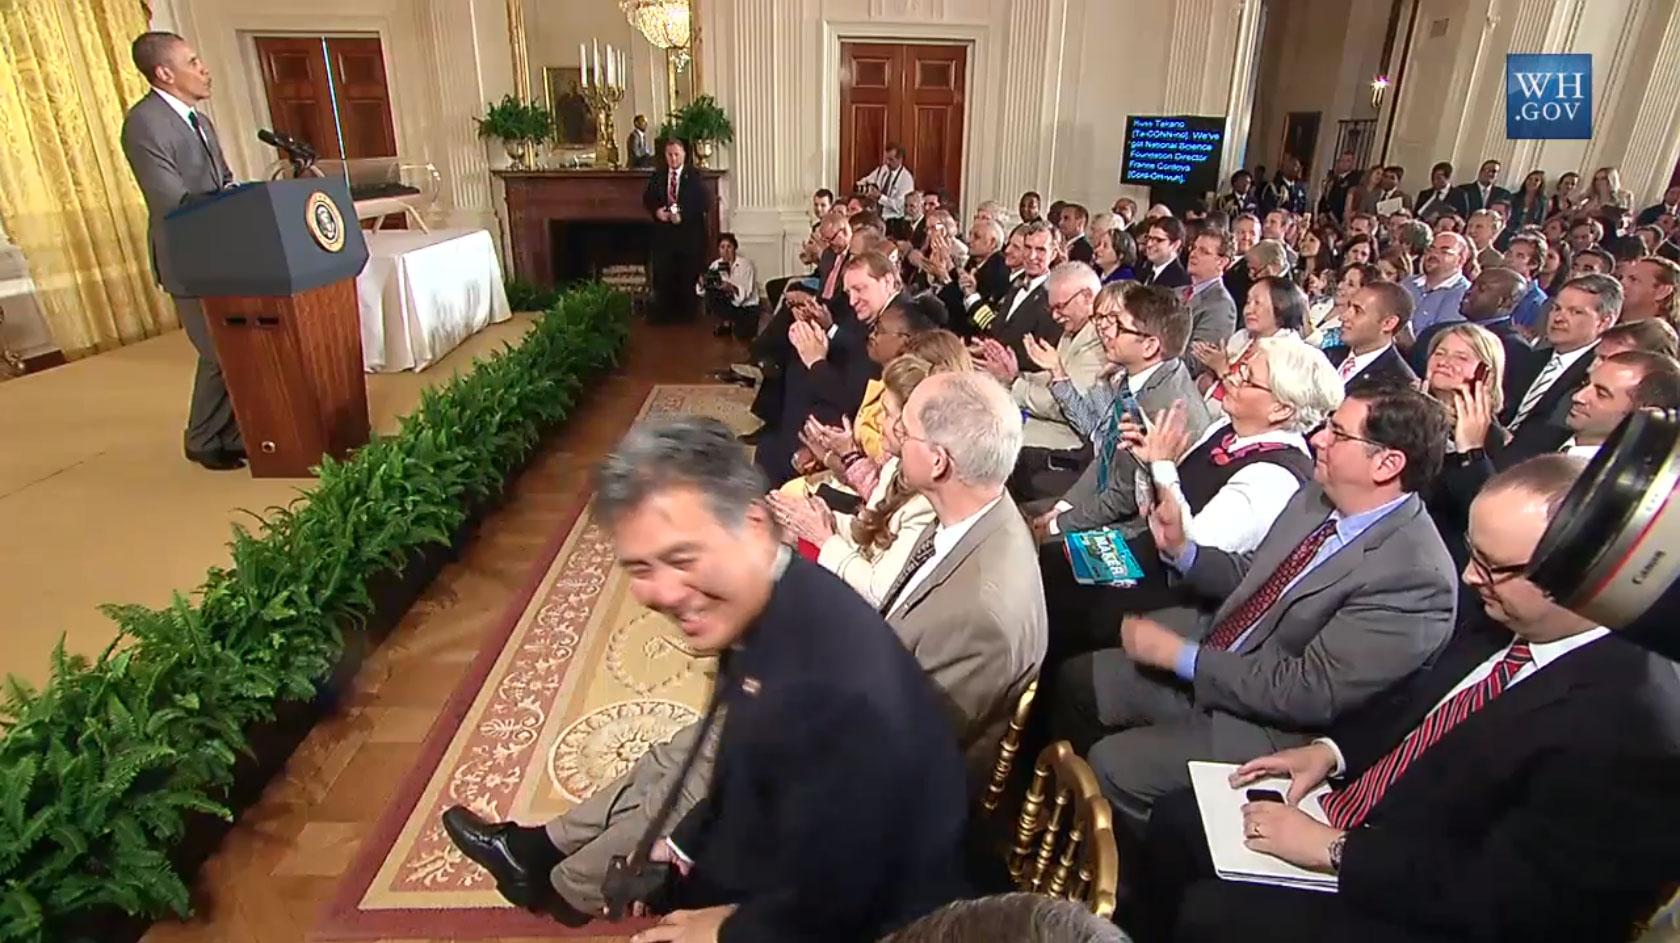 The President's Address at the White House Maker Faire